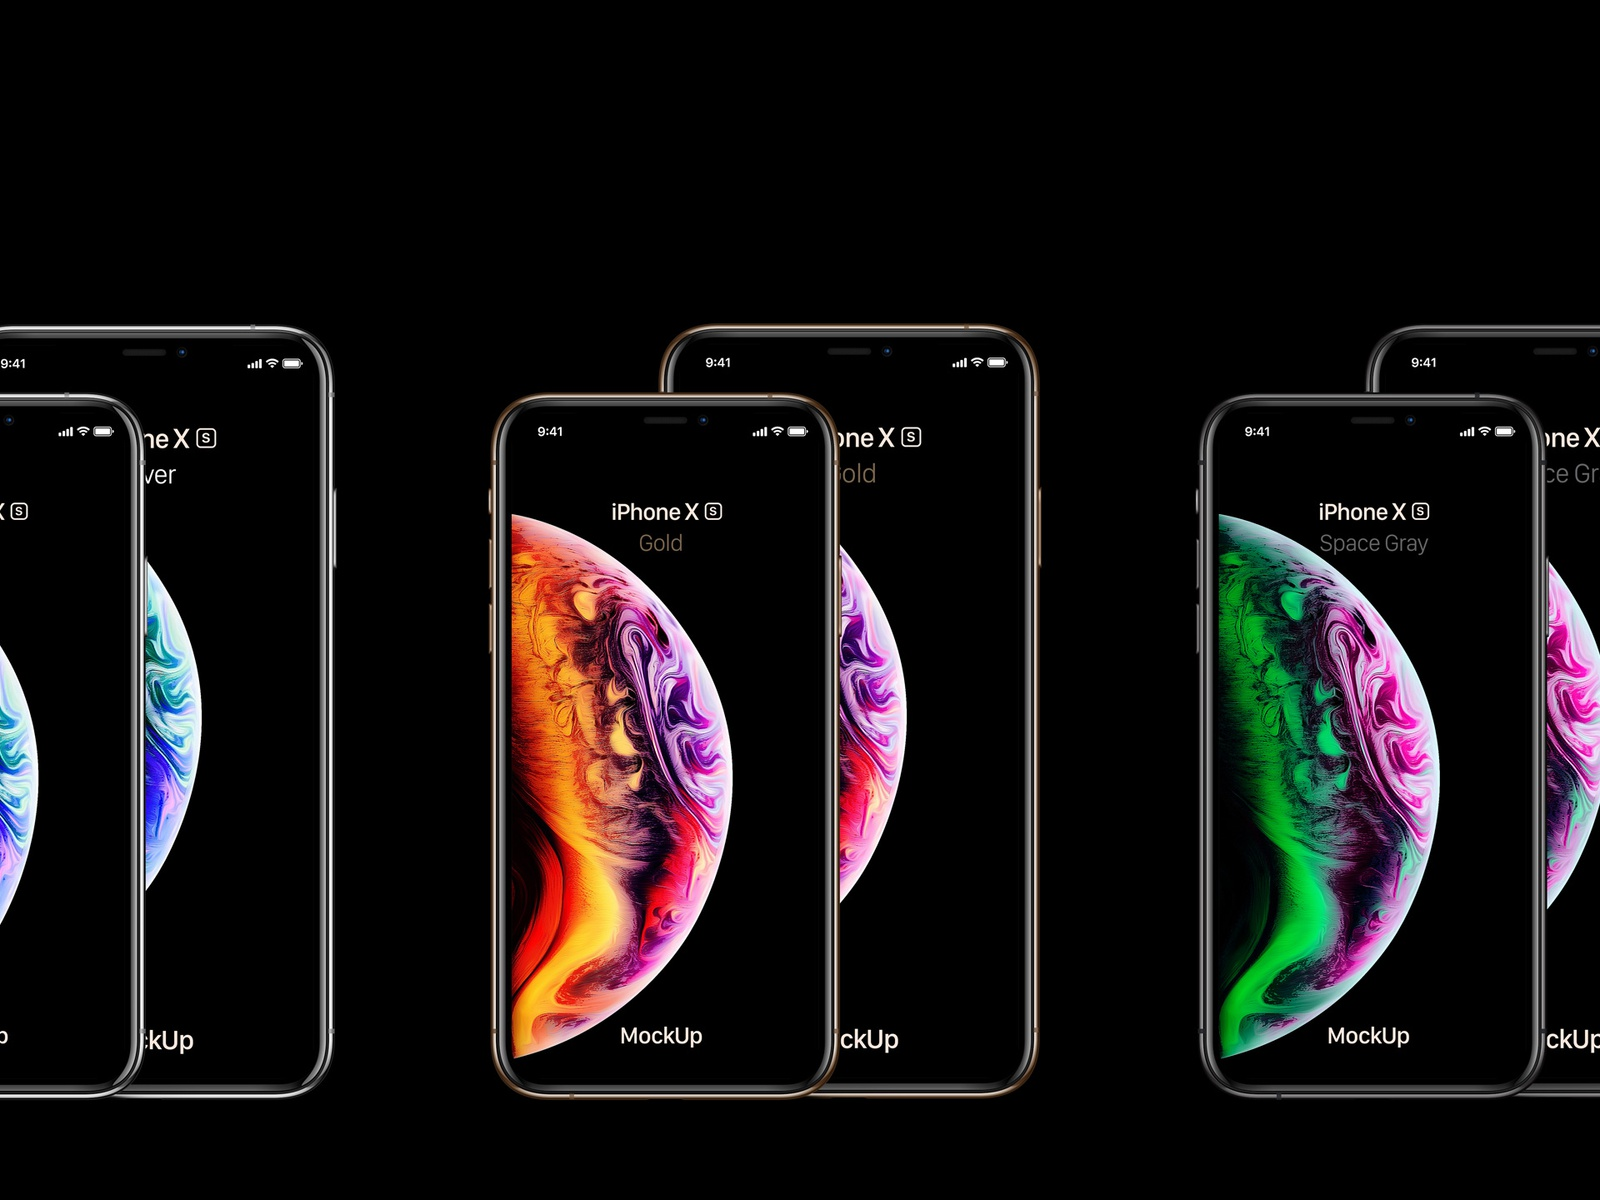 Free Psd iPhone Xs Max Mockup